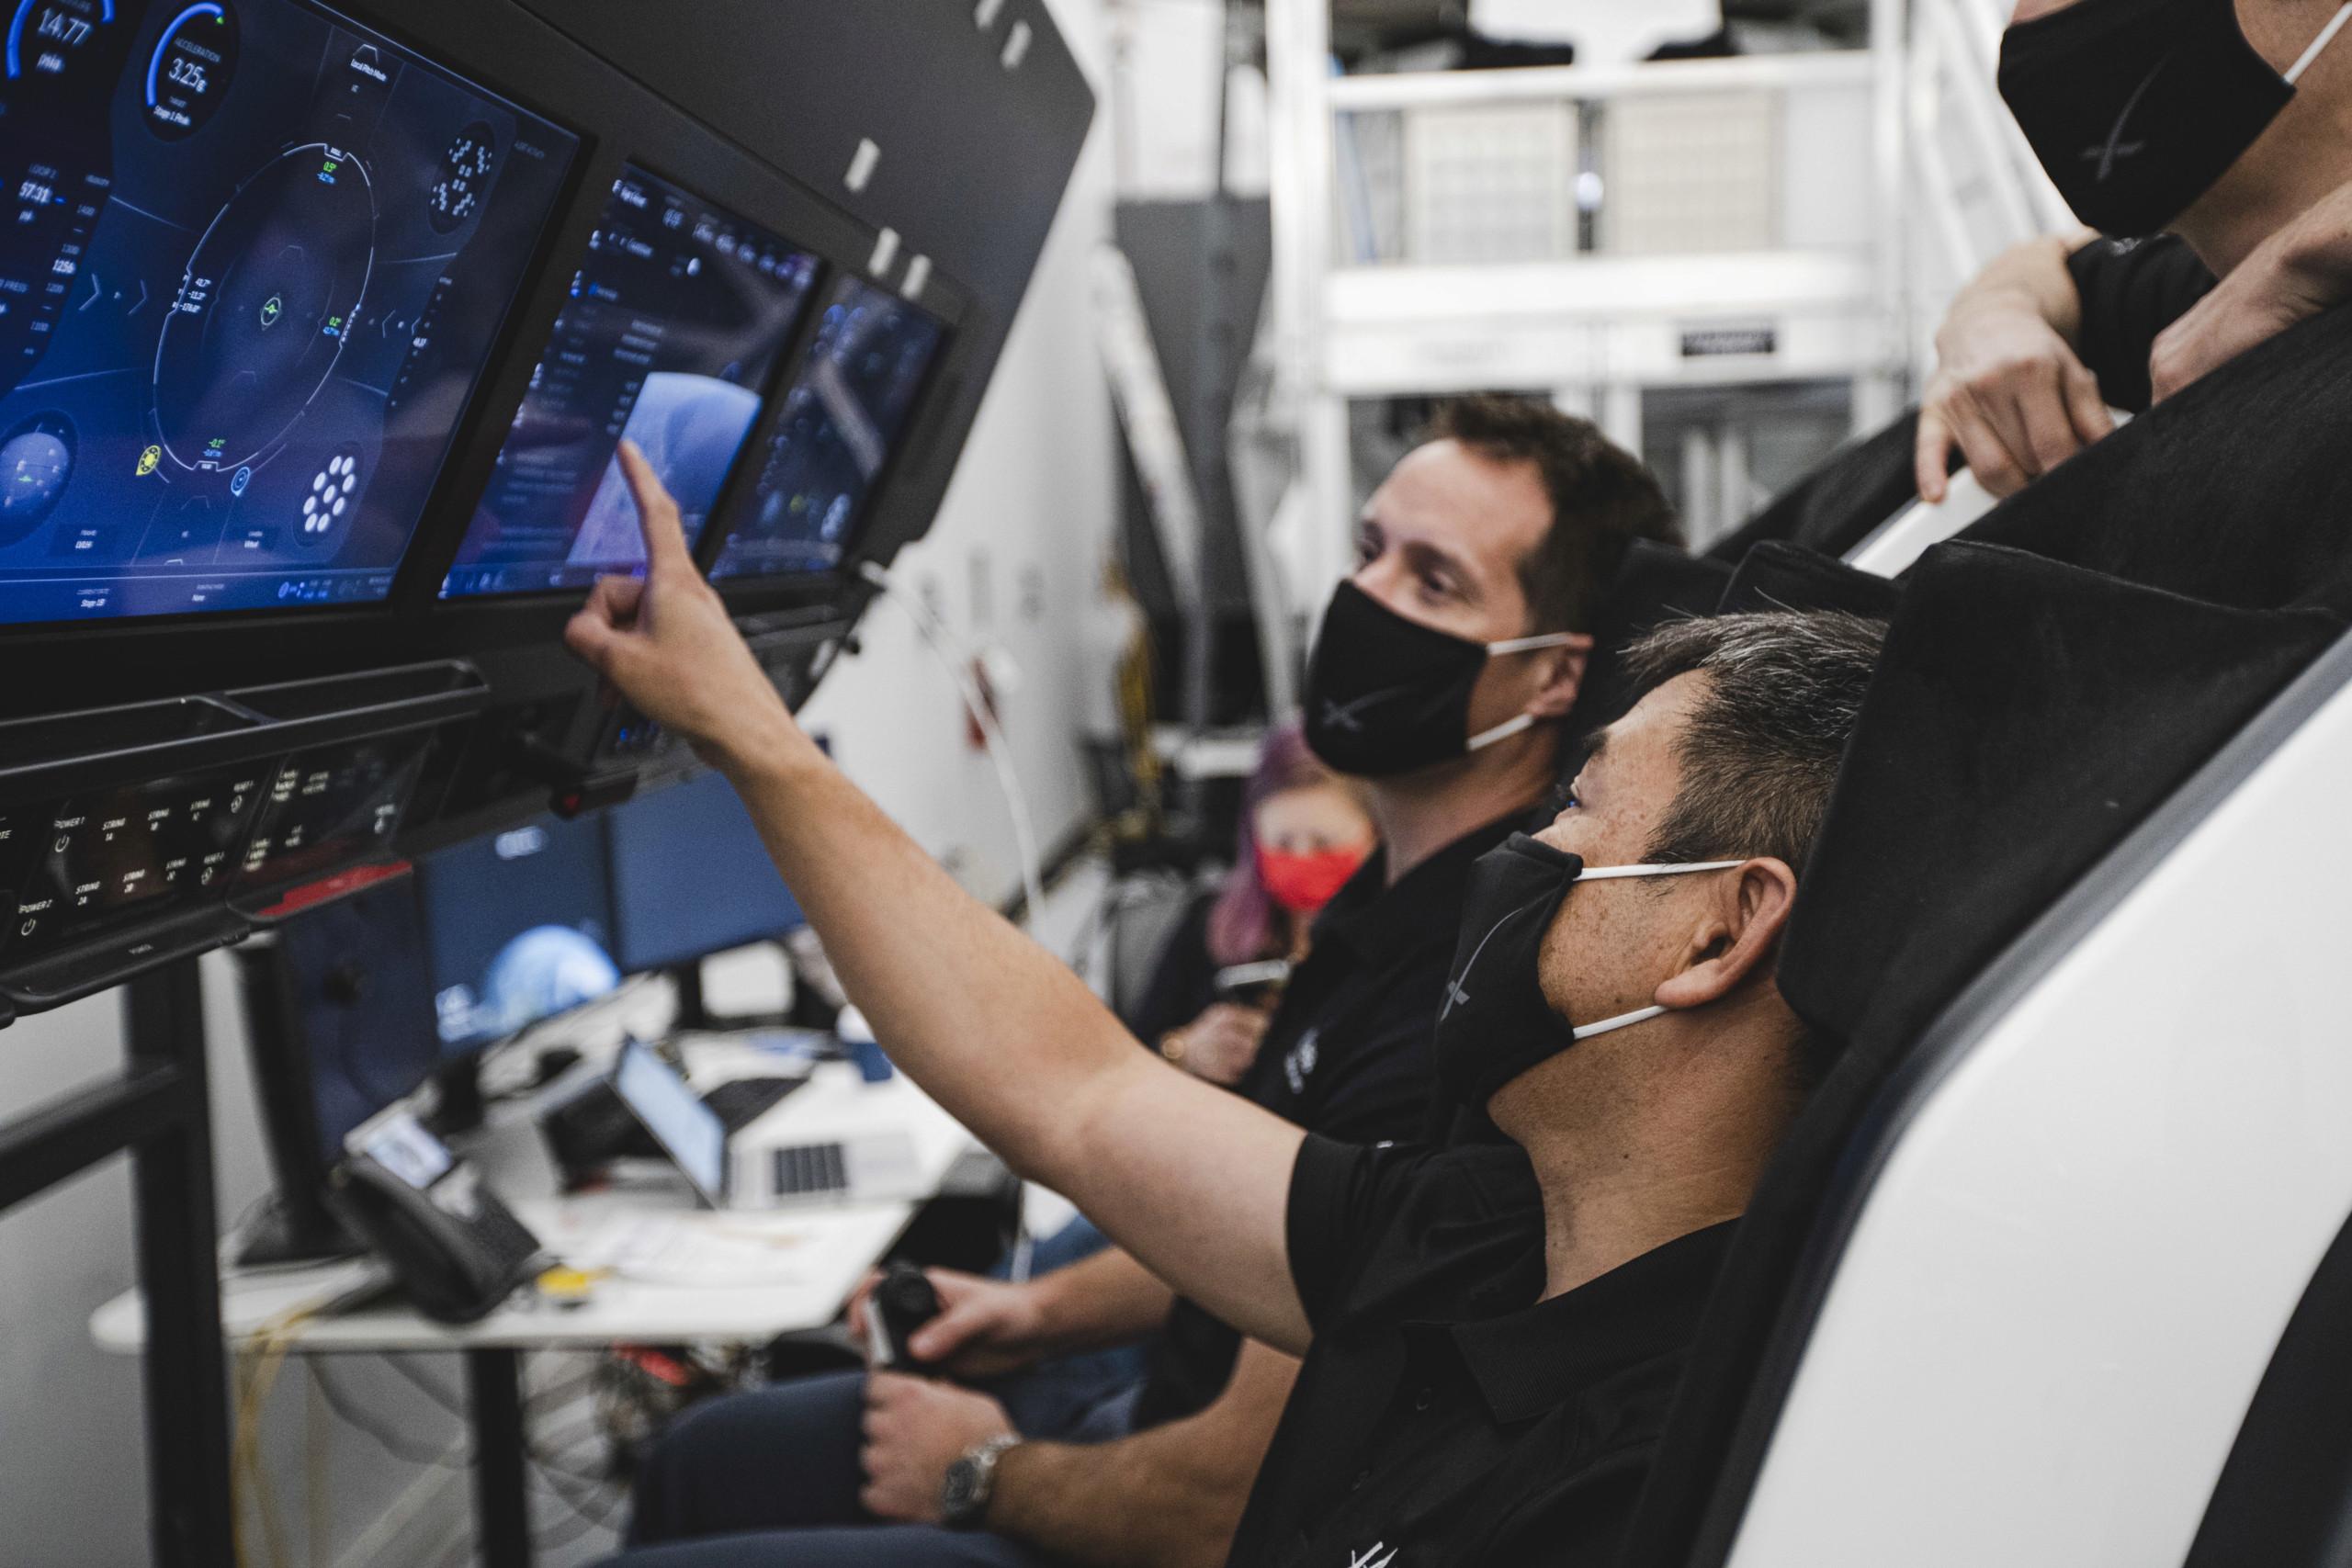 Falcon 9 (Crew Dragon USCV-2) - KSC - 23.4.2021 1_jfi123